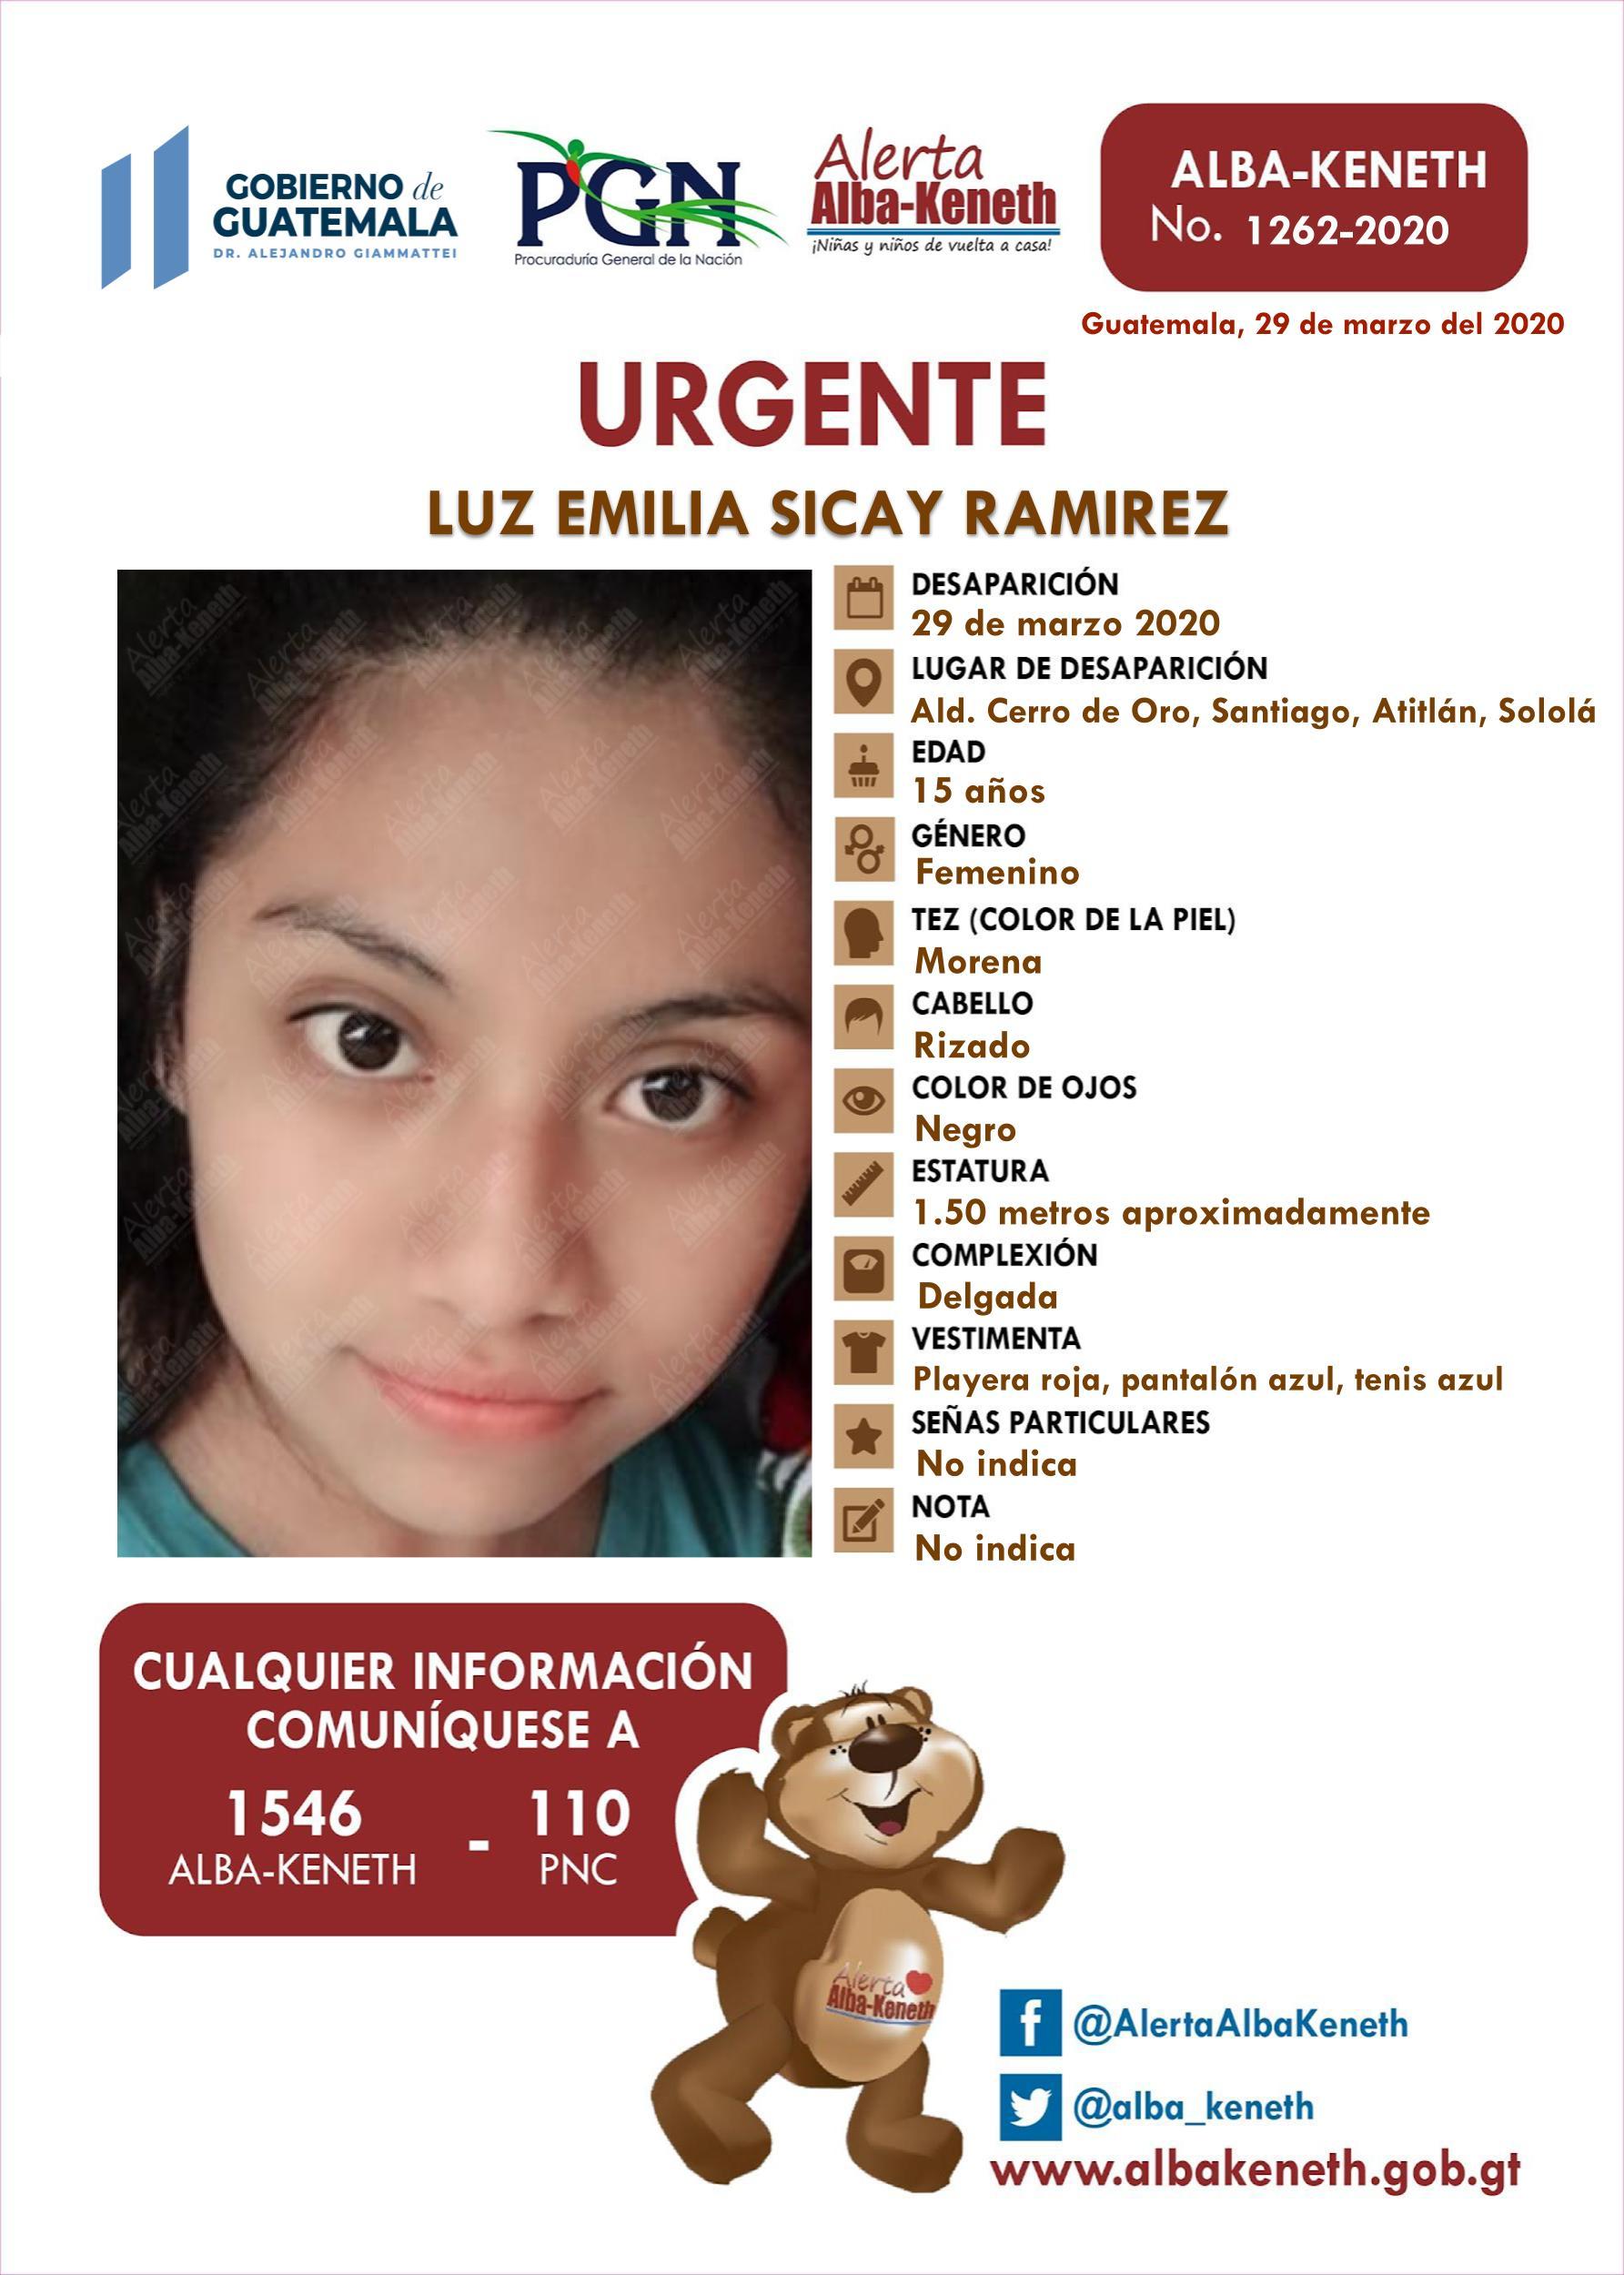 Luz Emilia Sicay Ramirez